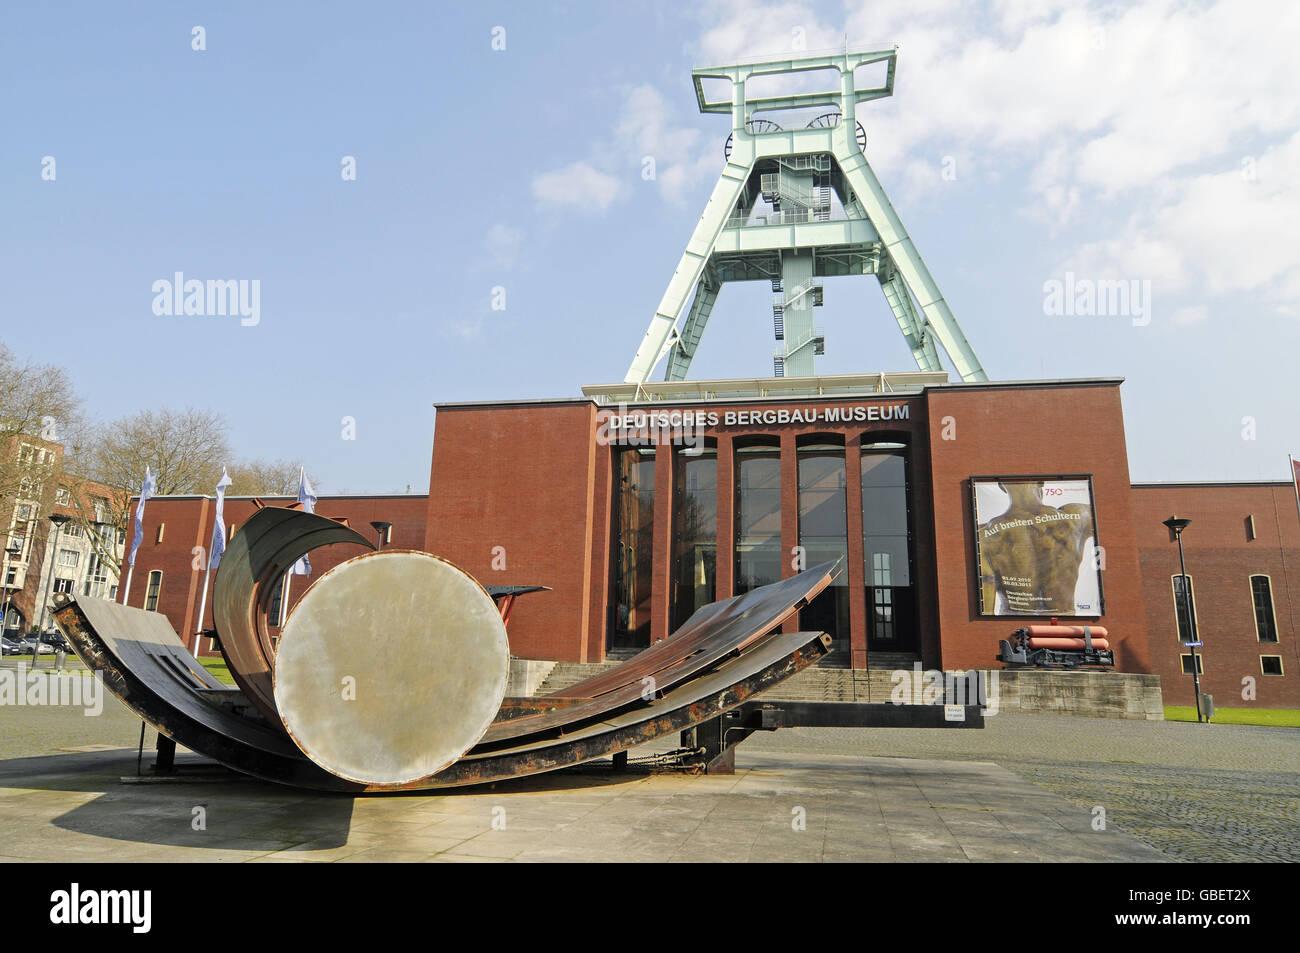 German Mining Museum, Bochum, North Rhine-Westphalia, Germany - Stock Image